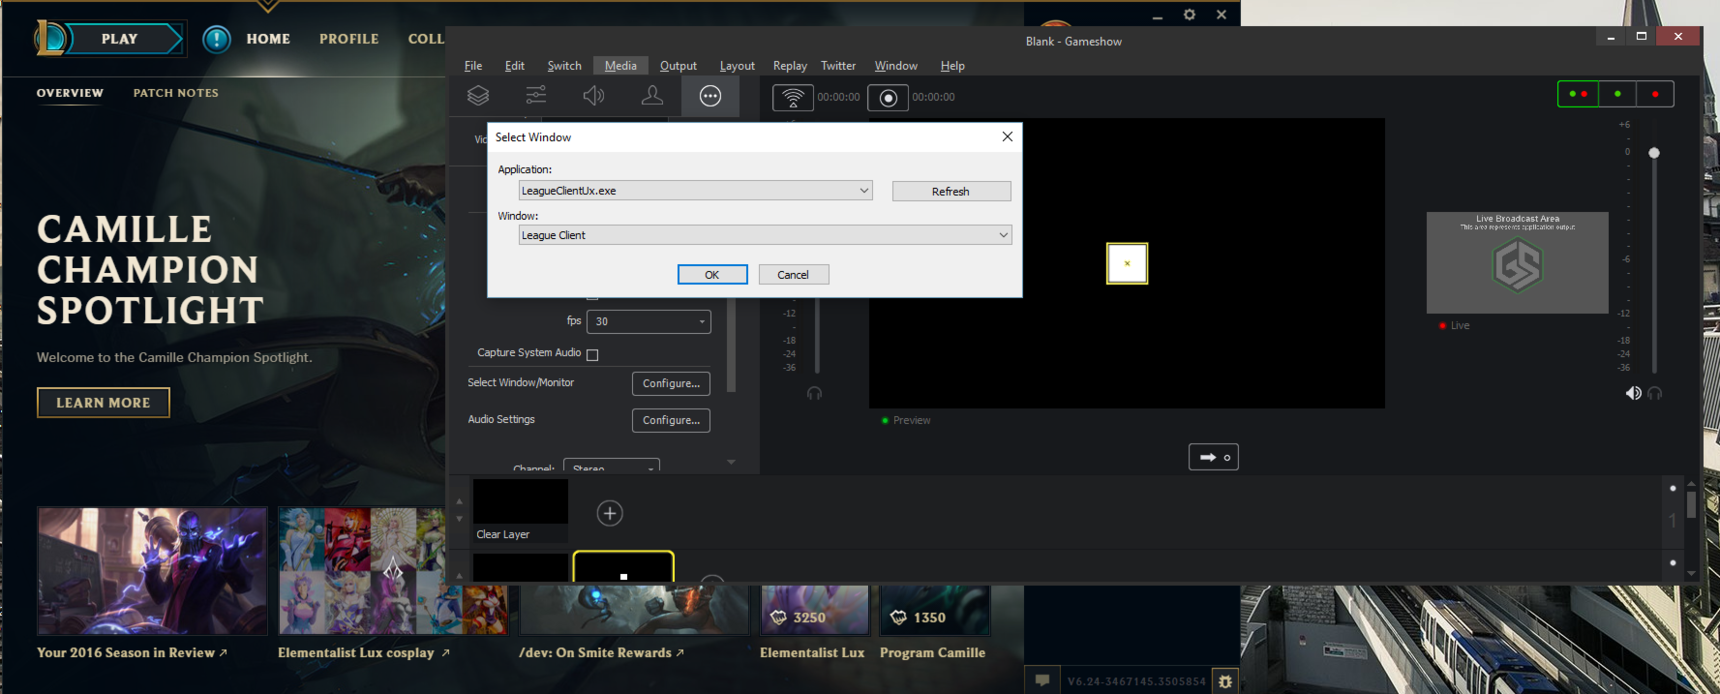 League of legends open Alpha client not captured in 3 5 beta